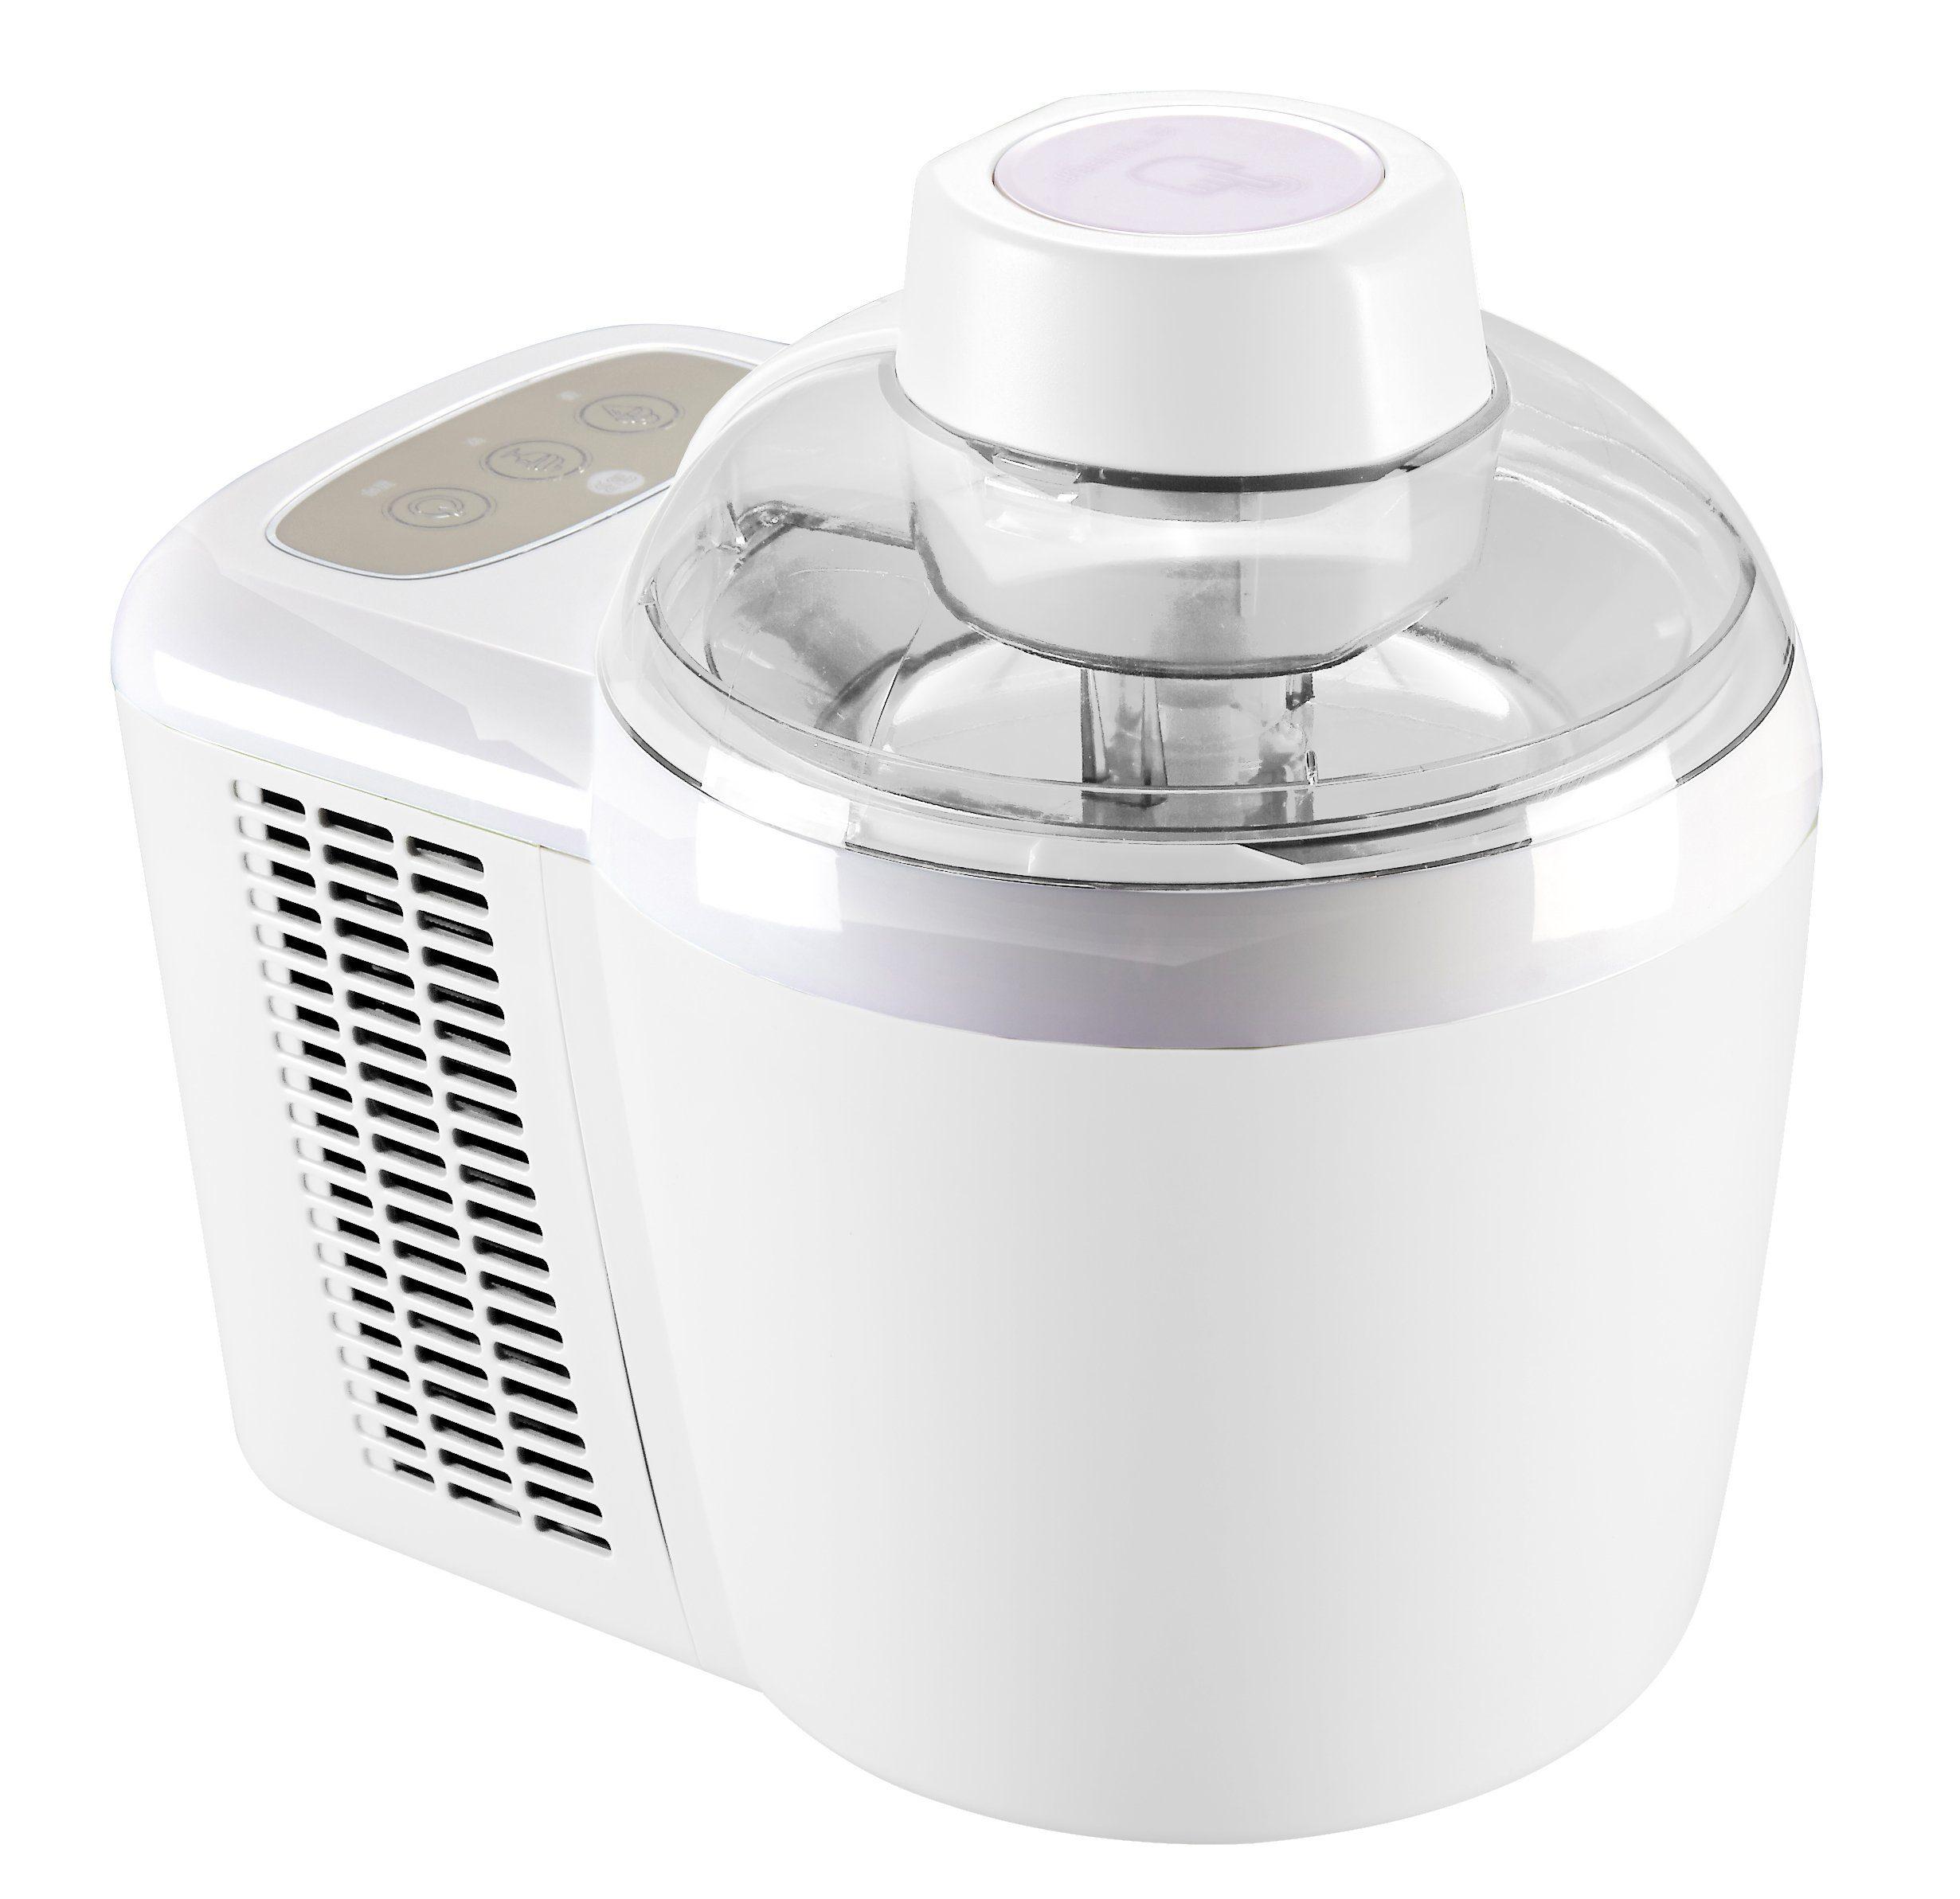 Trebs Eismaschine mit Kompressor, 90 Watt »Comfortice 99325 €«